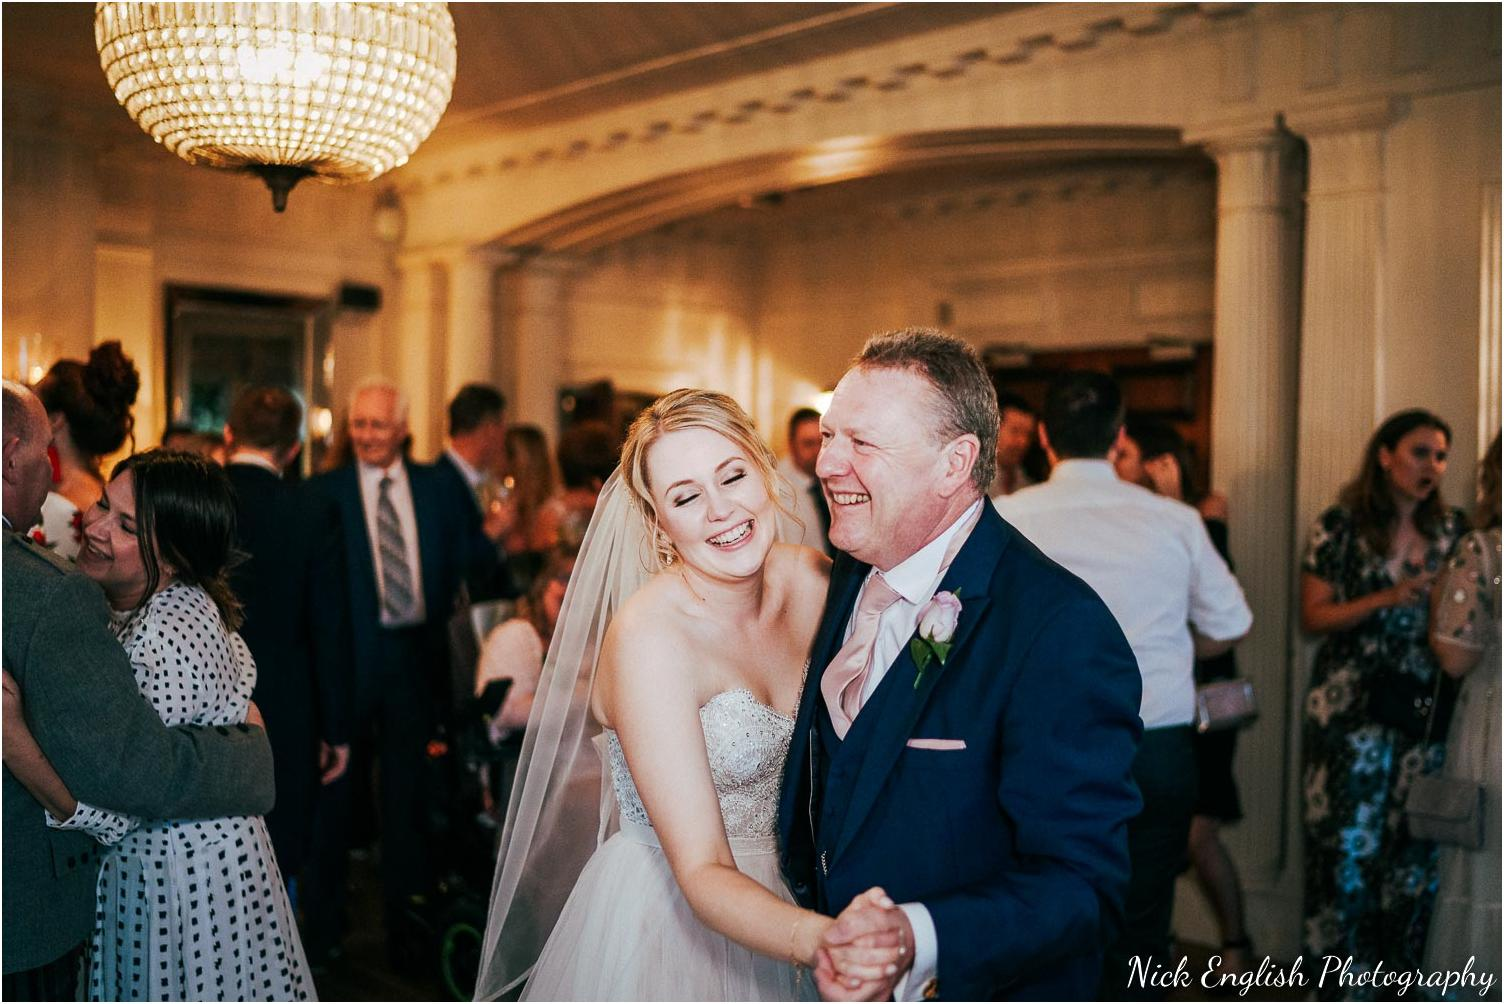 Eaves_Hall_Wedding_Photographer-111.jpg